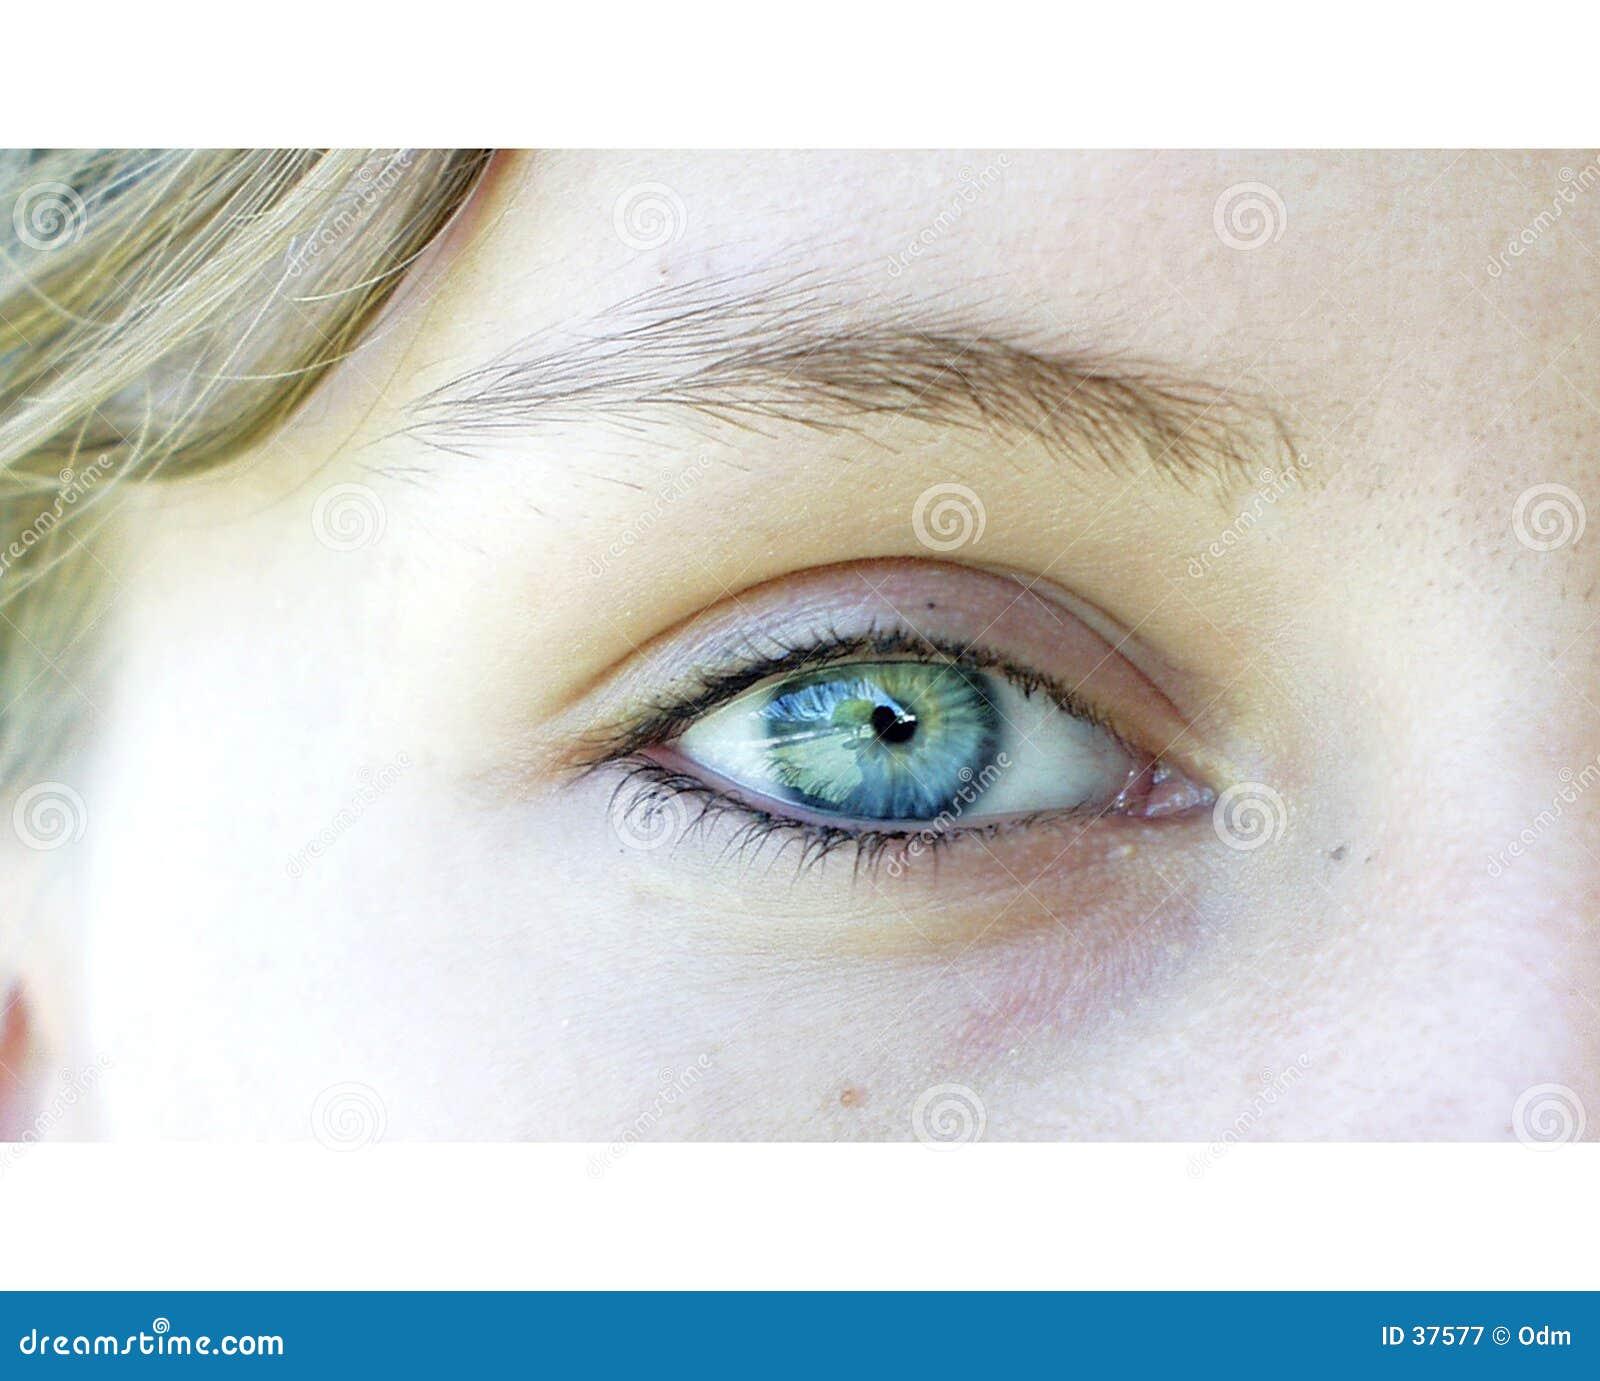 Download Ojo azul imagen de archivo. Imagen de viewpoint, opinión - 37577